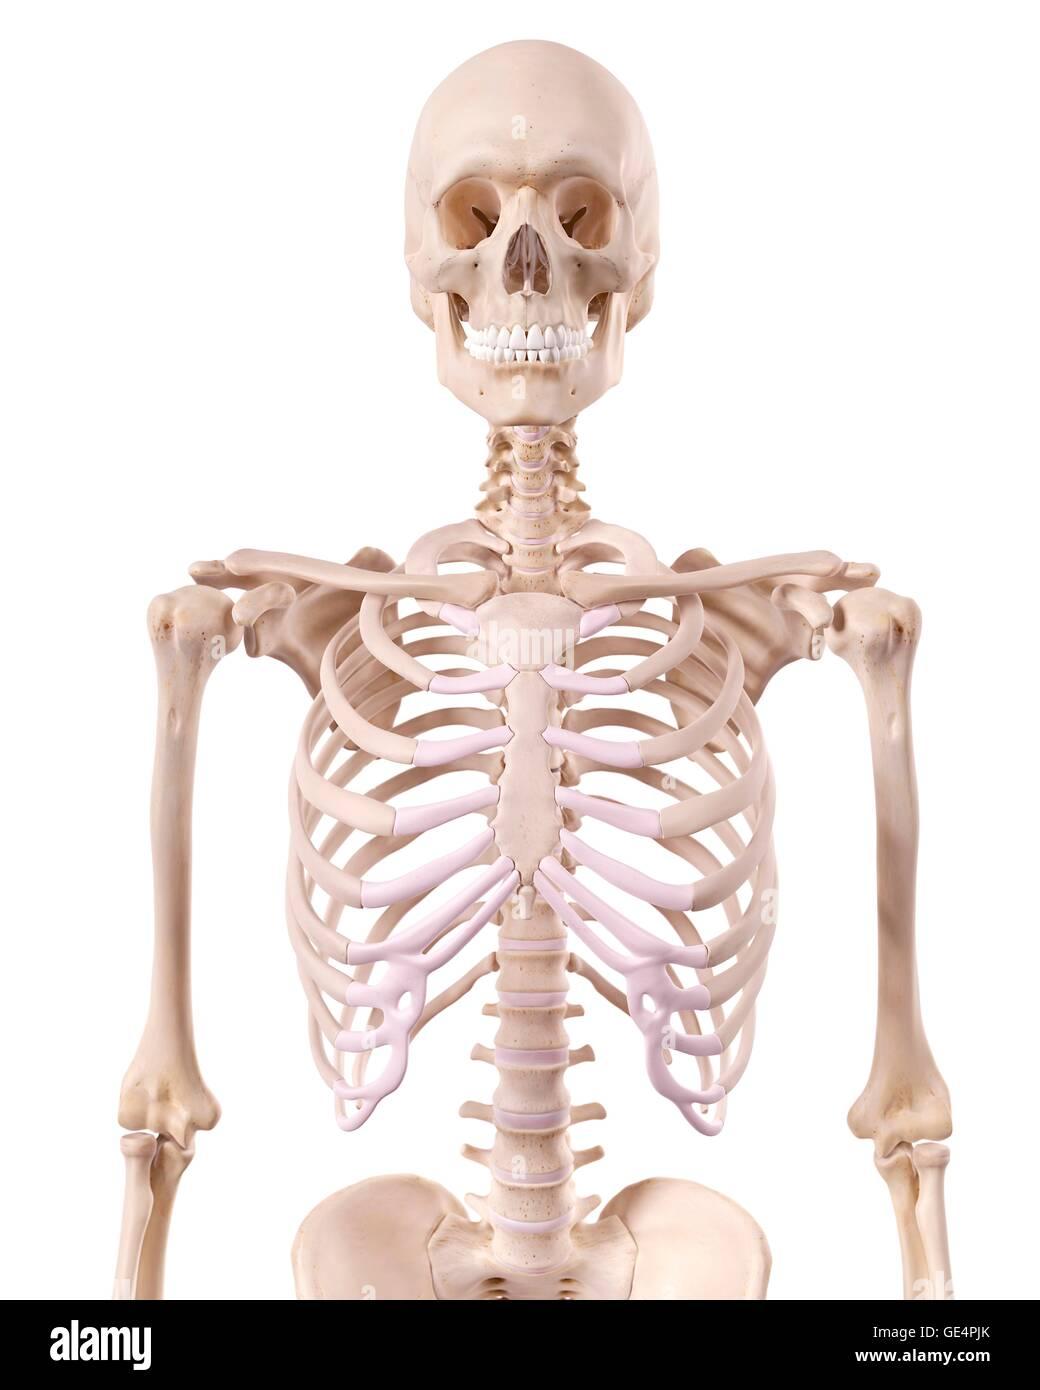 Human Skeletal Structure Illustration Stock Photo 111972971 Alamy